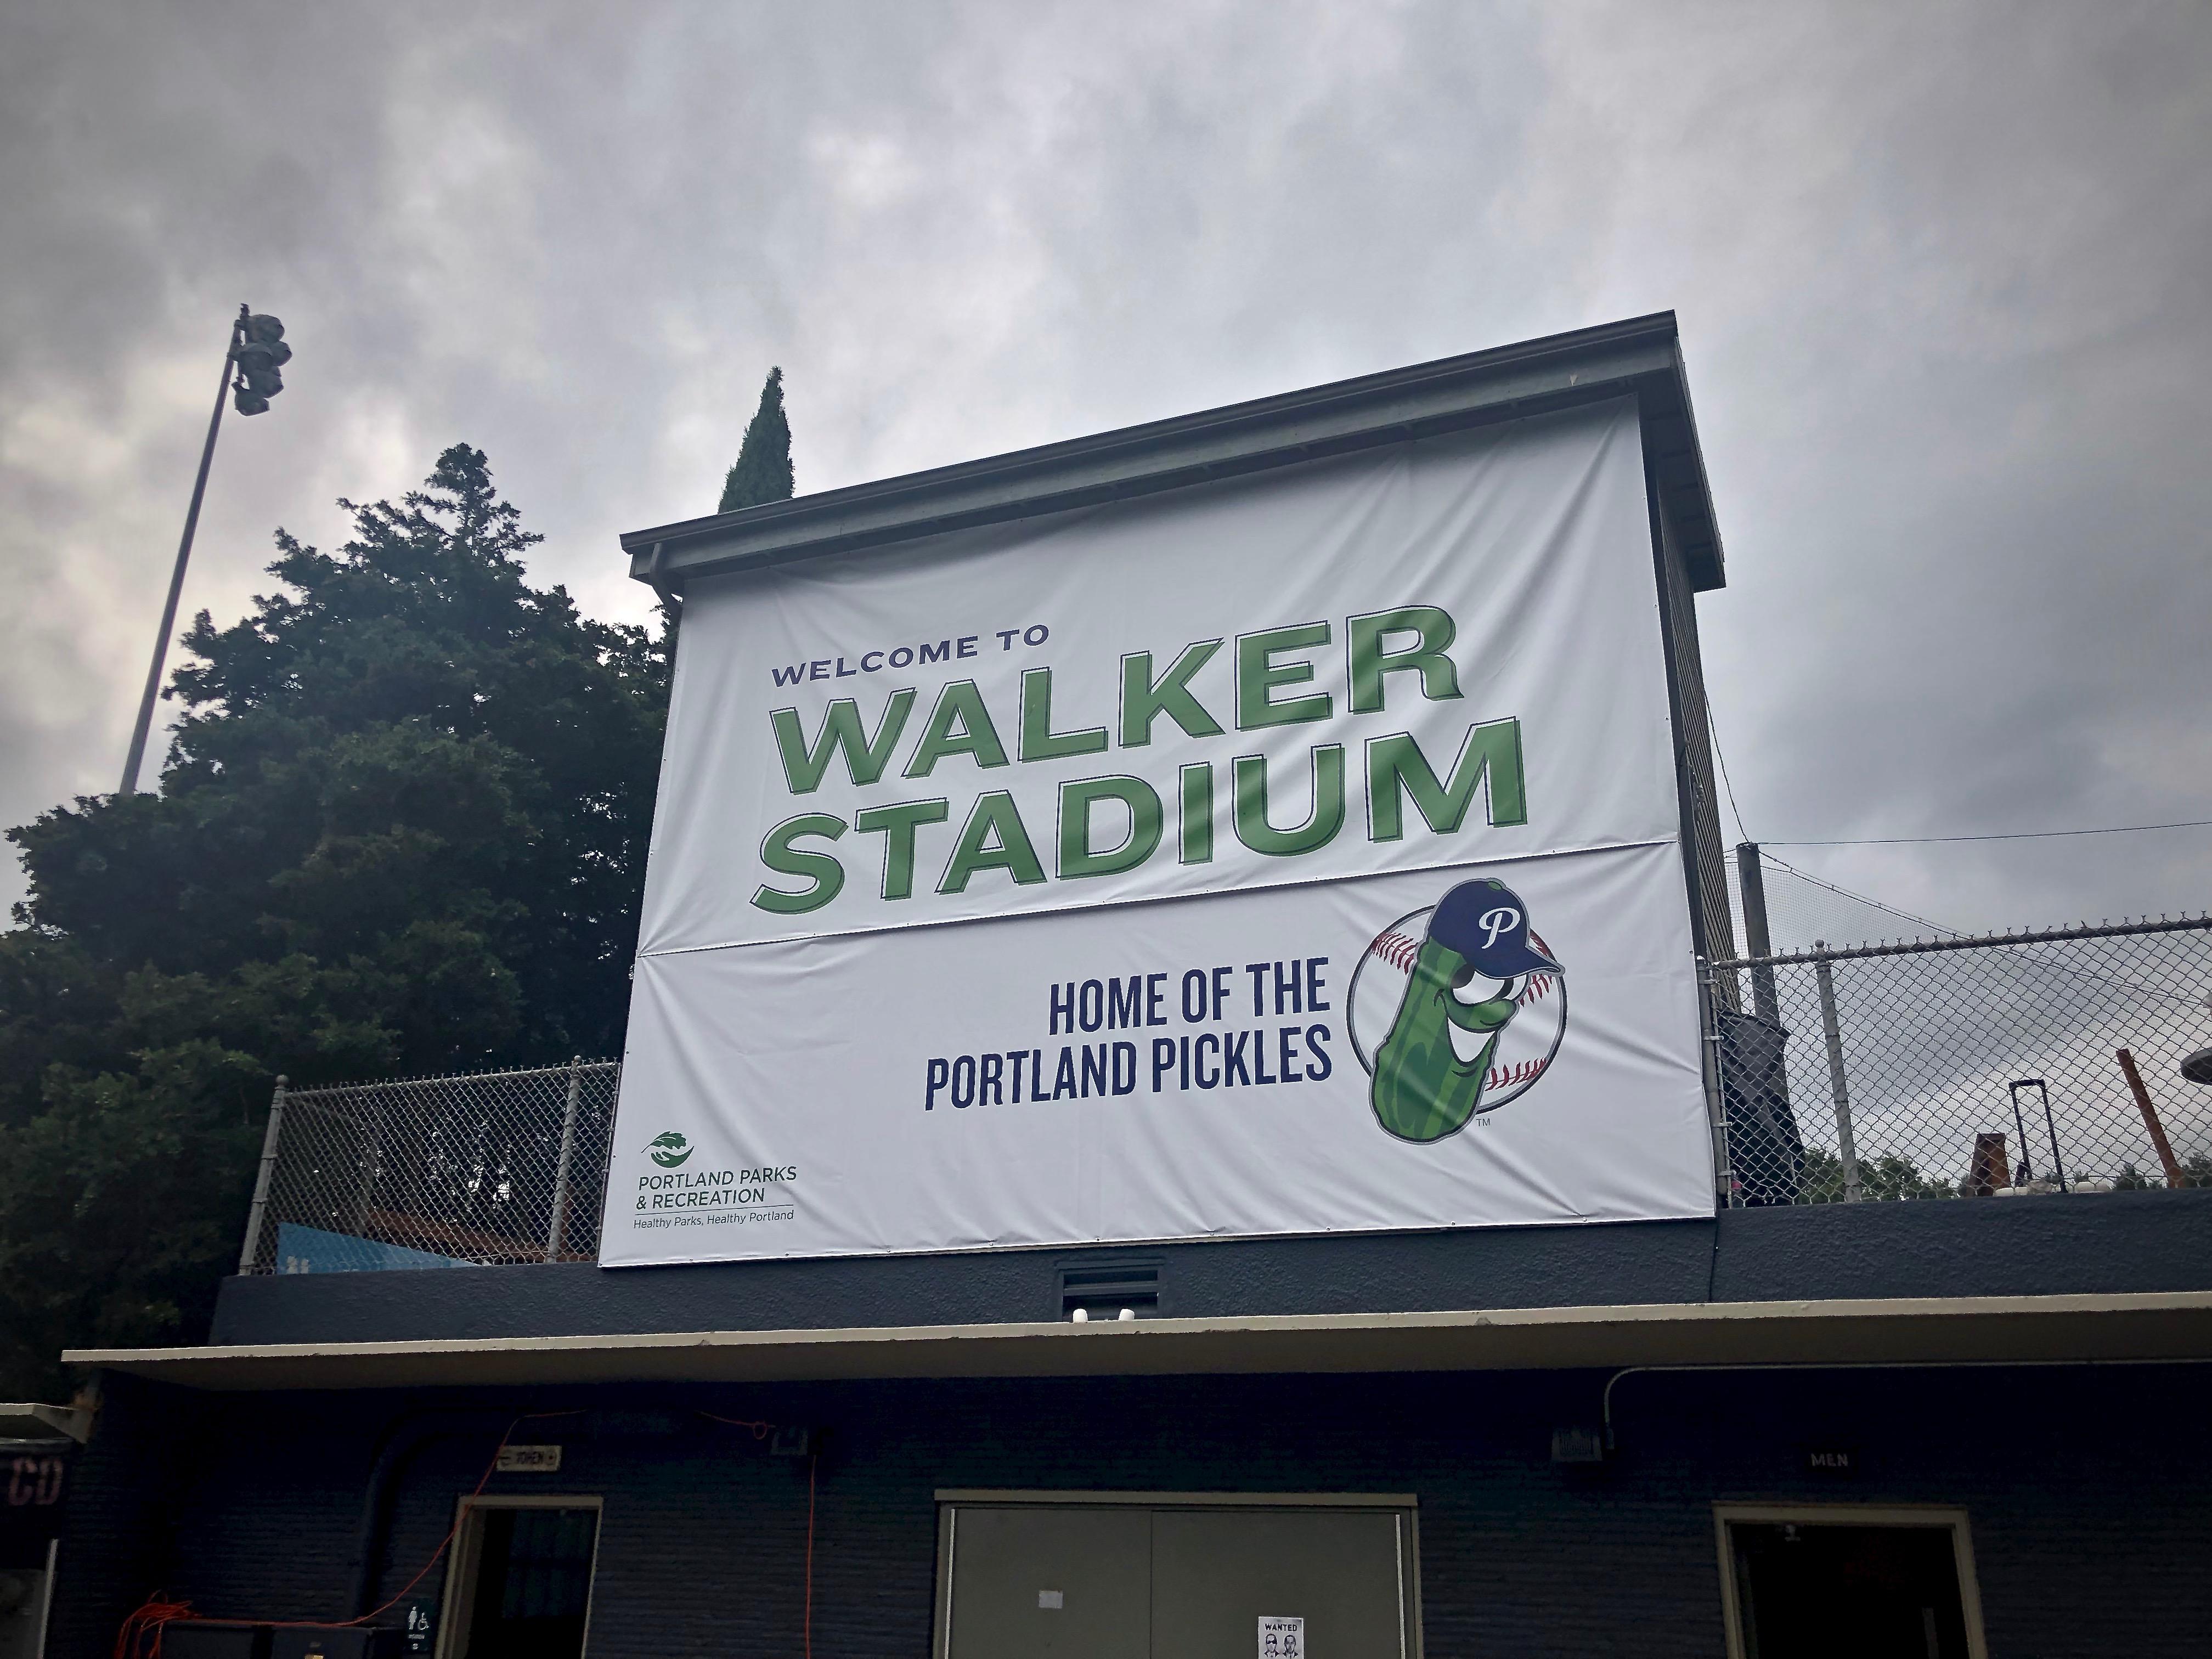 Walker Stadium, home of the Portland Pickles.